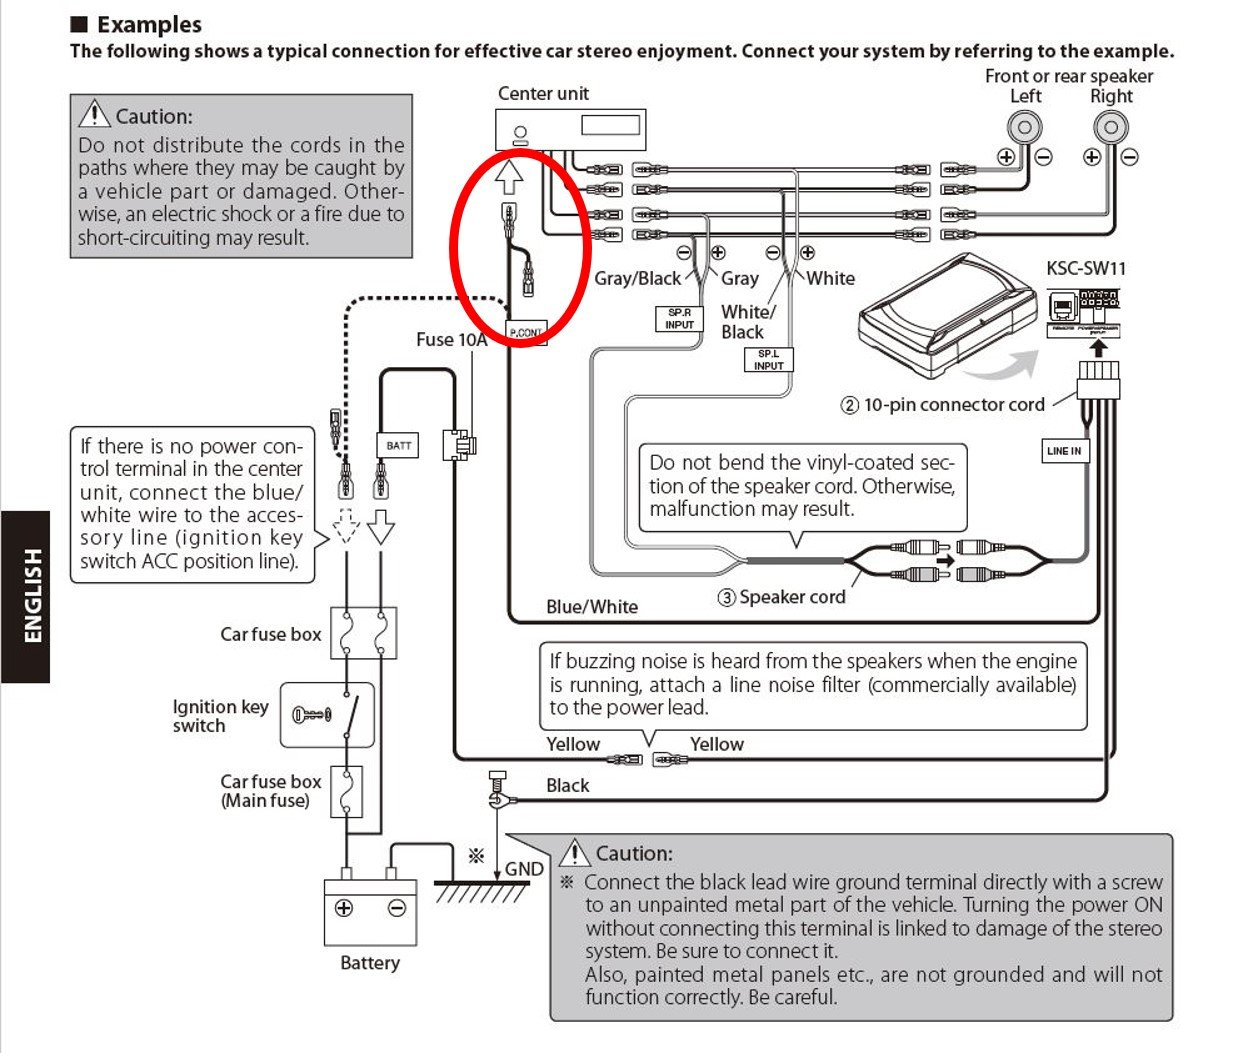 [GJFJ_338]  Sub Woofer Install - Page 2 - Skoda Octavia Mk III (2013 onward) - BRISKODA | Kenwood Ksc Sw11 Wiring Harness Diagram Model |  | BRISKODA